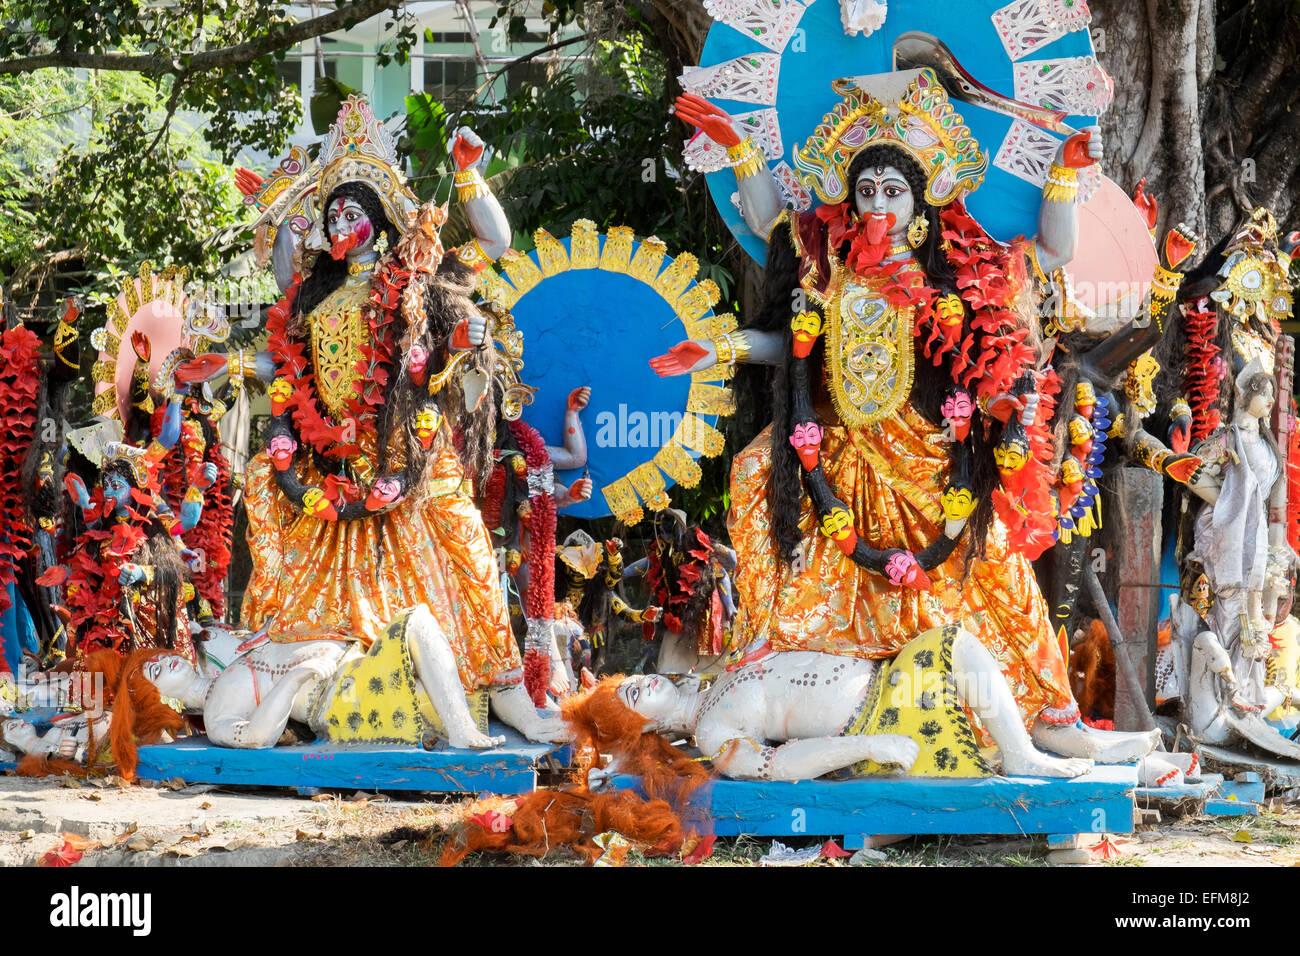 Hindu deities, models of Gods on the banks of the River Brahmaputra Assam NE India - Stock Image